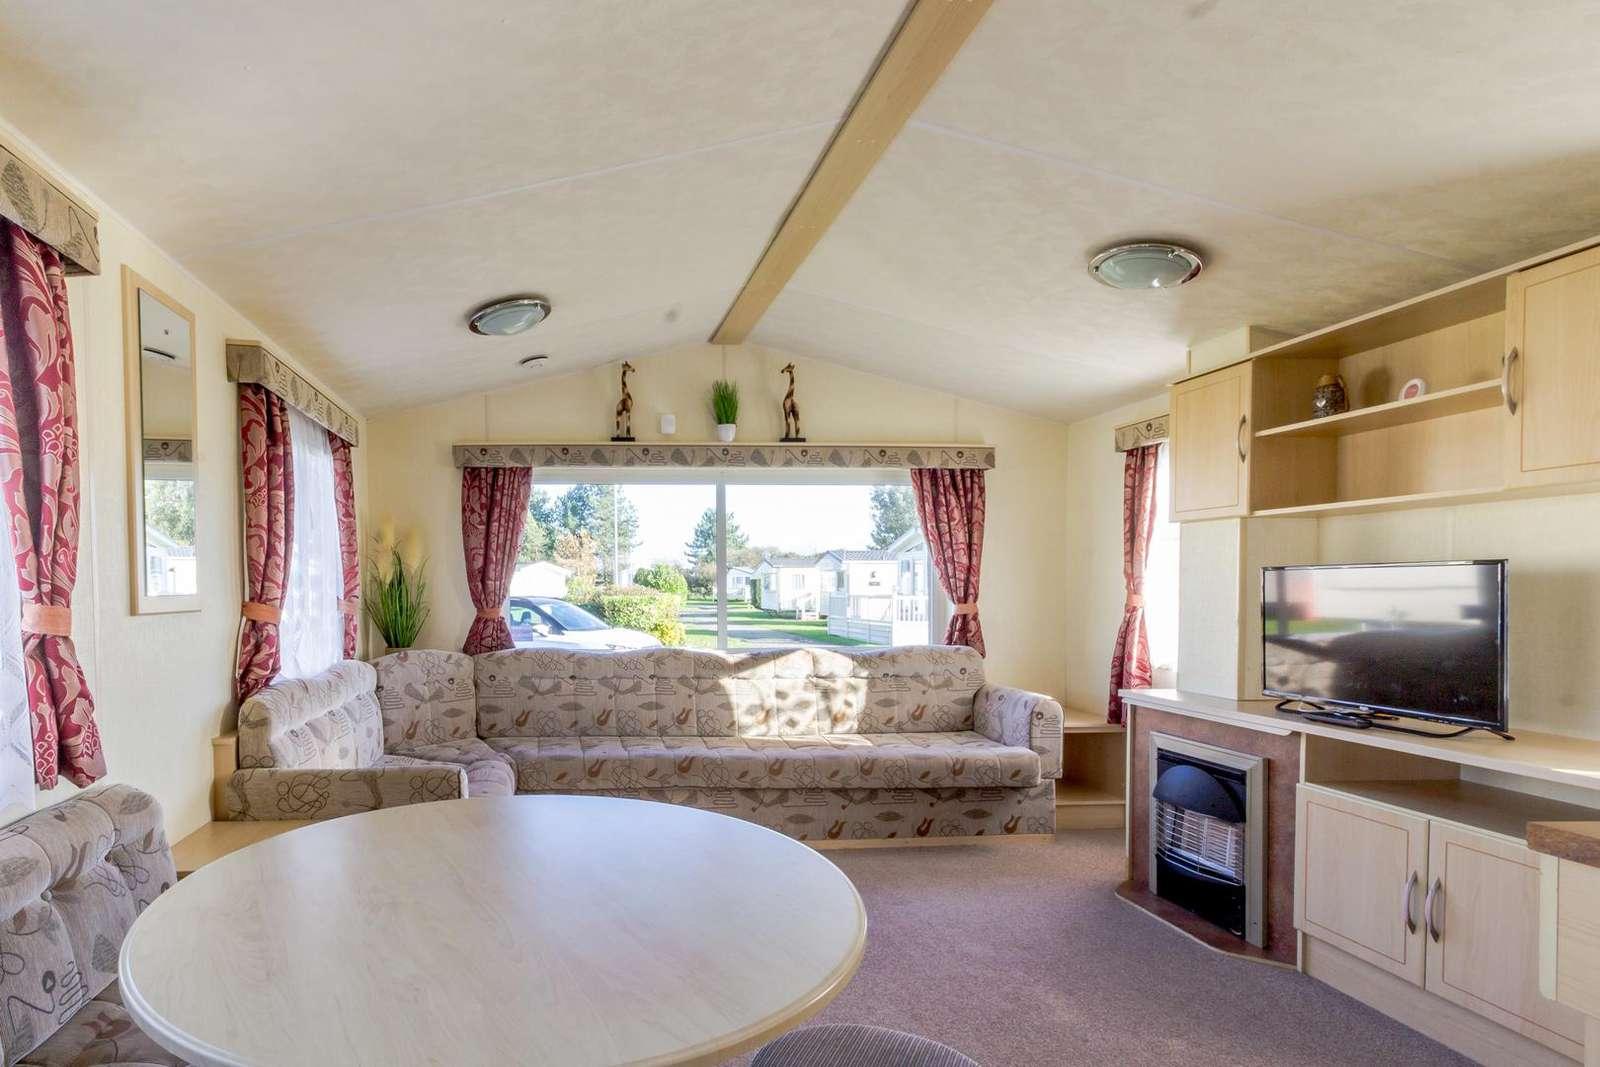 10030B – Bure Village area. 3 bed, 8 berth caravan. Emerald rated. - property